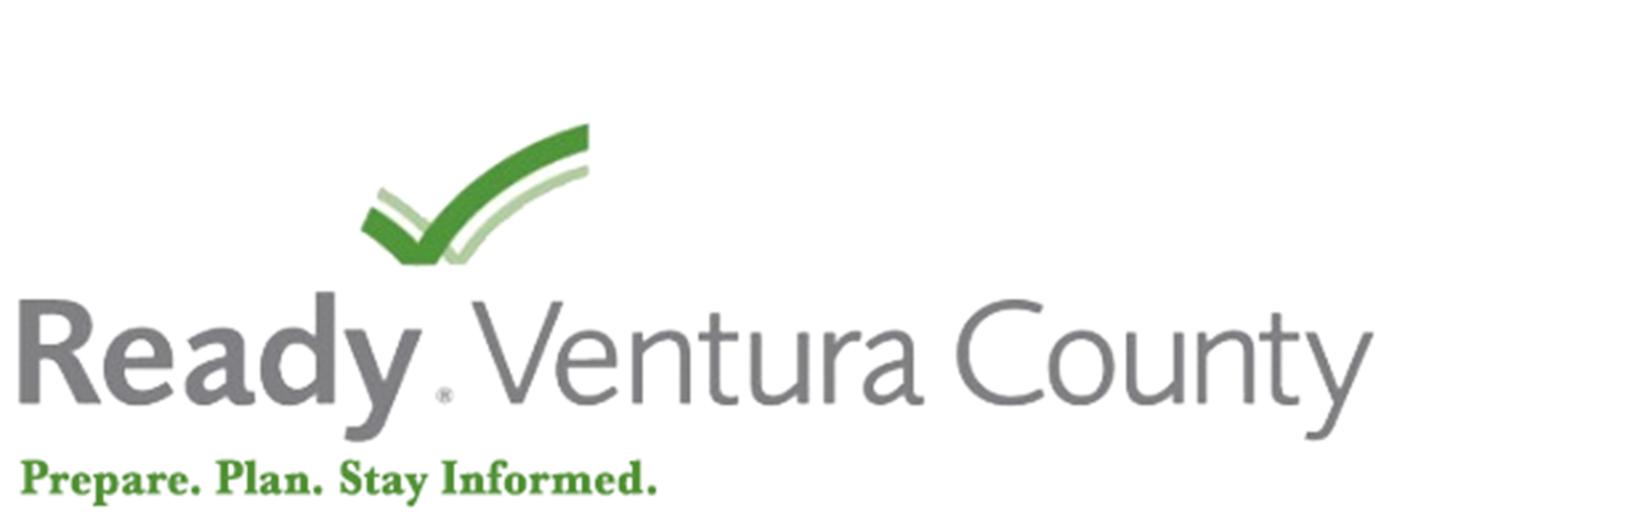 Full List of Ventura County Evacuation Centers